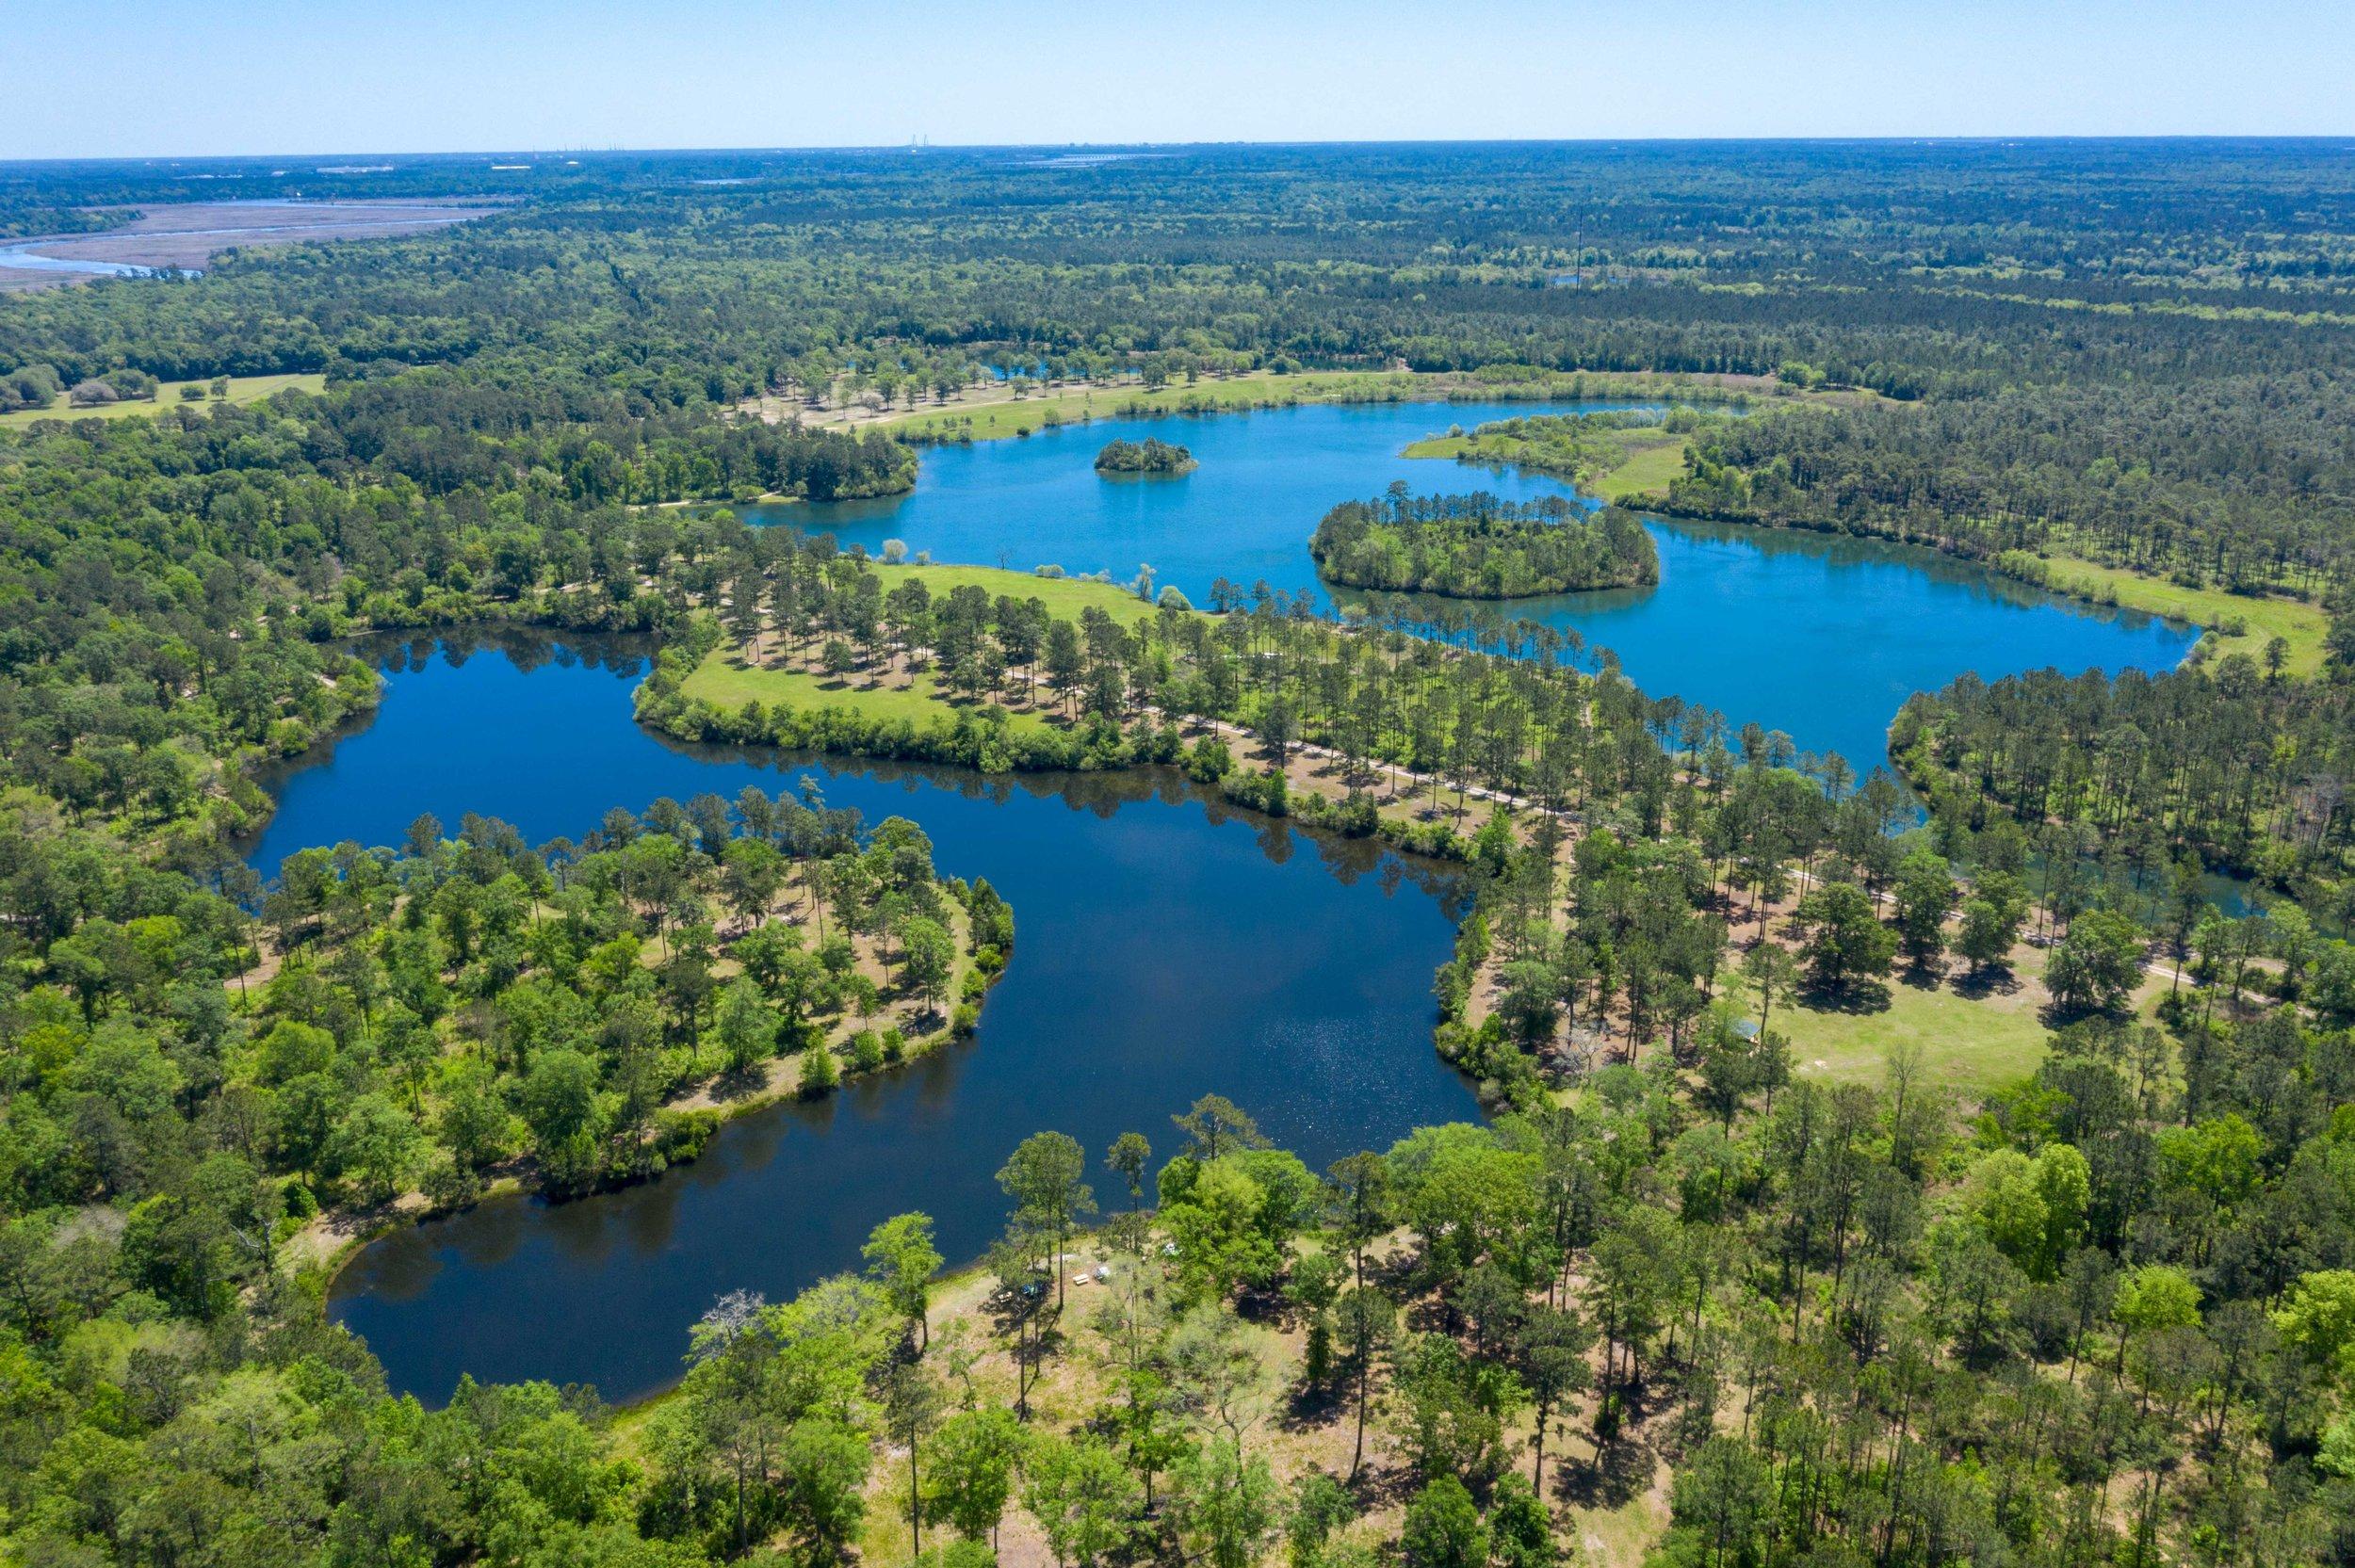 Lake Charleston & Palmetto Lake